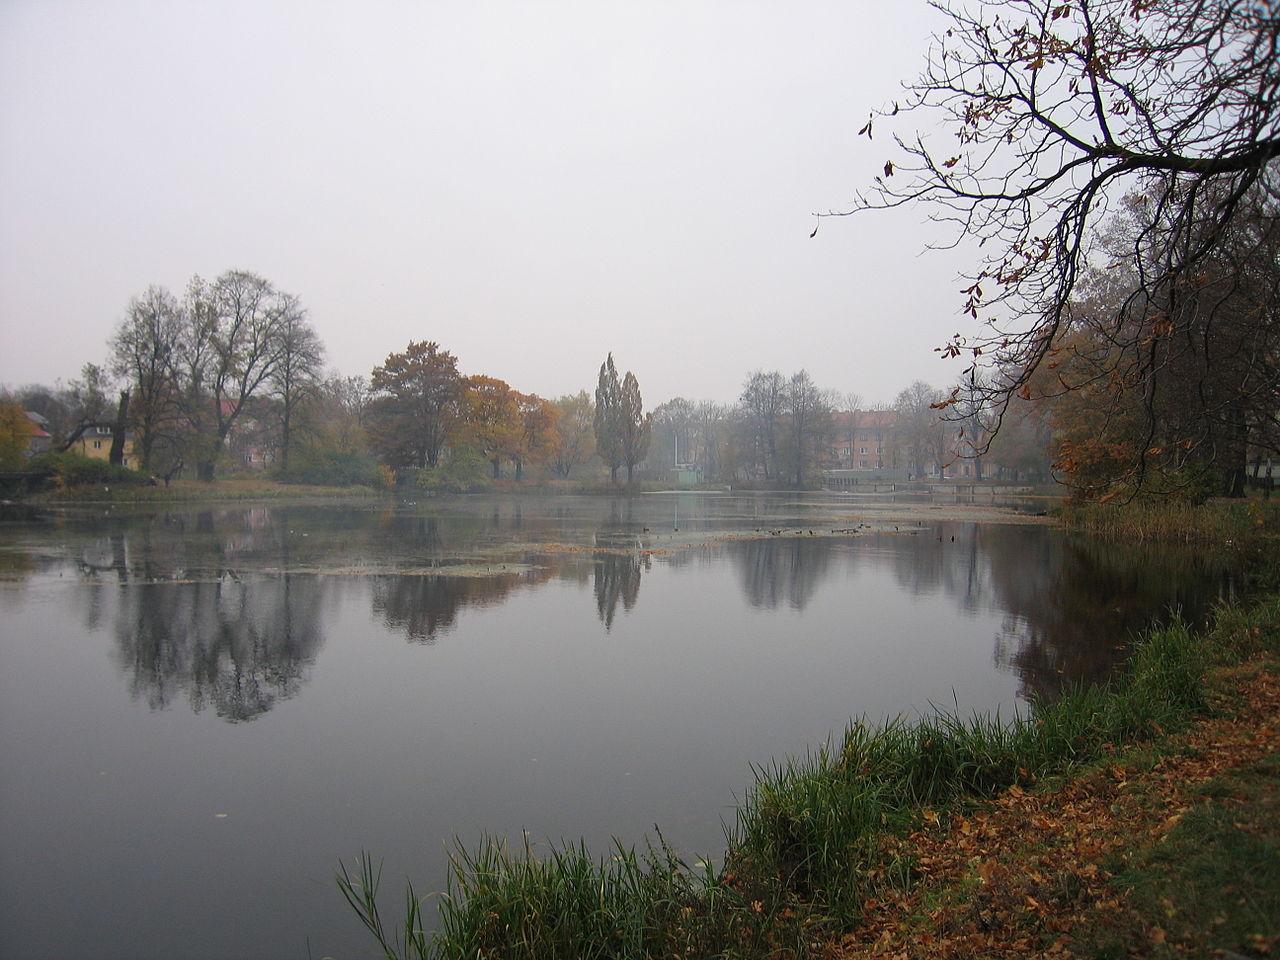 Амалиенау, пруд Близнецов (Цвиллингтайх)